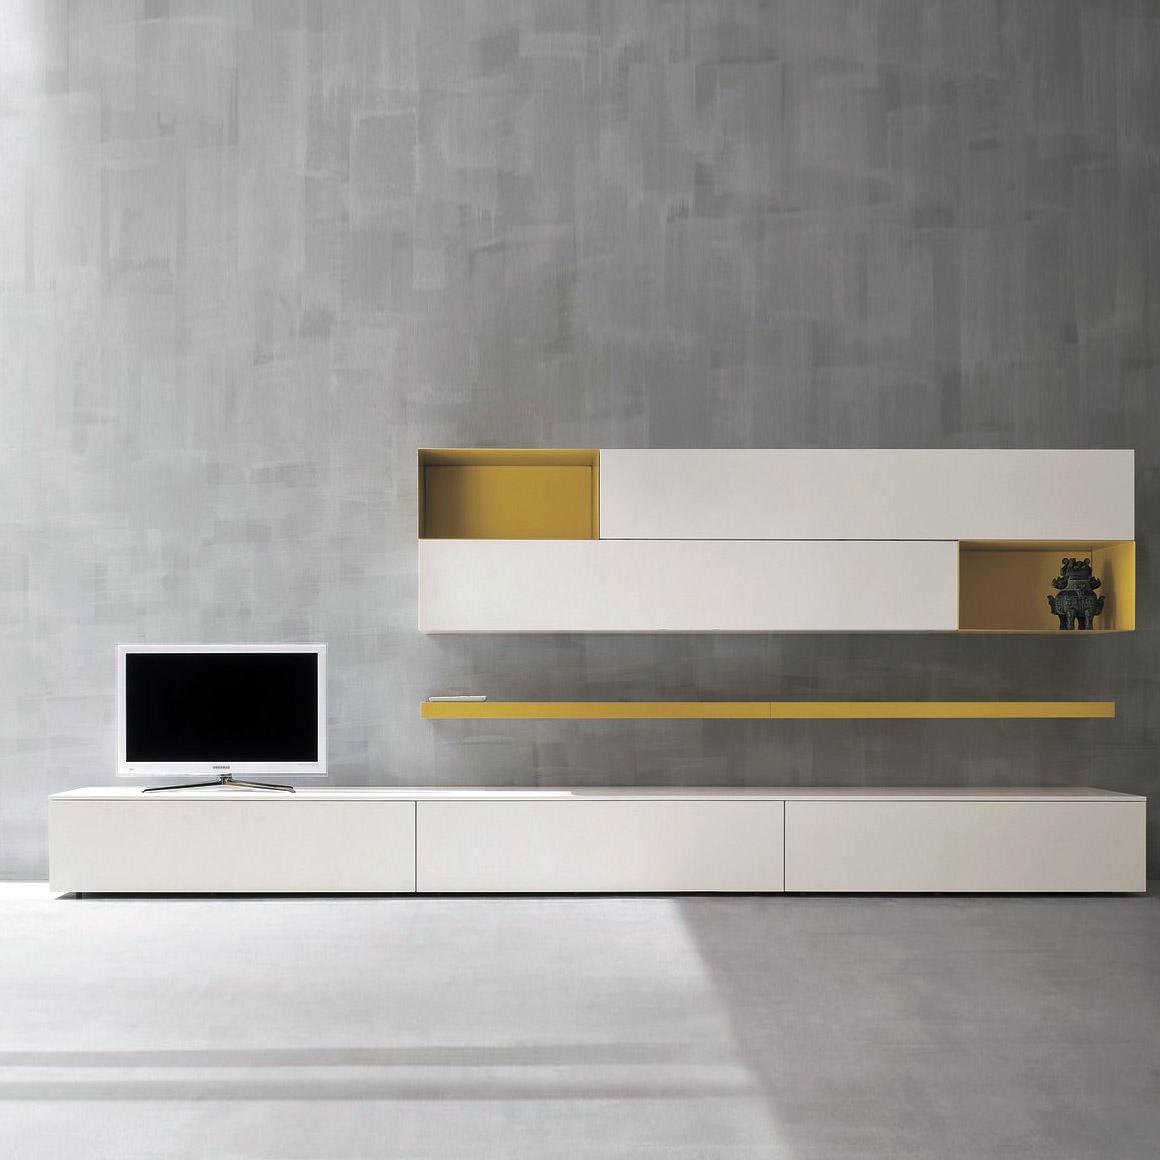 dall-agnese-tv-unit-stright-lines-minimalist-design-white-colour.jpg